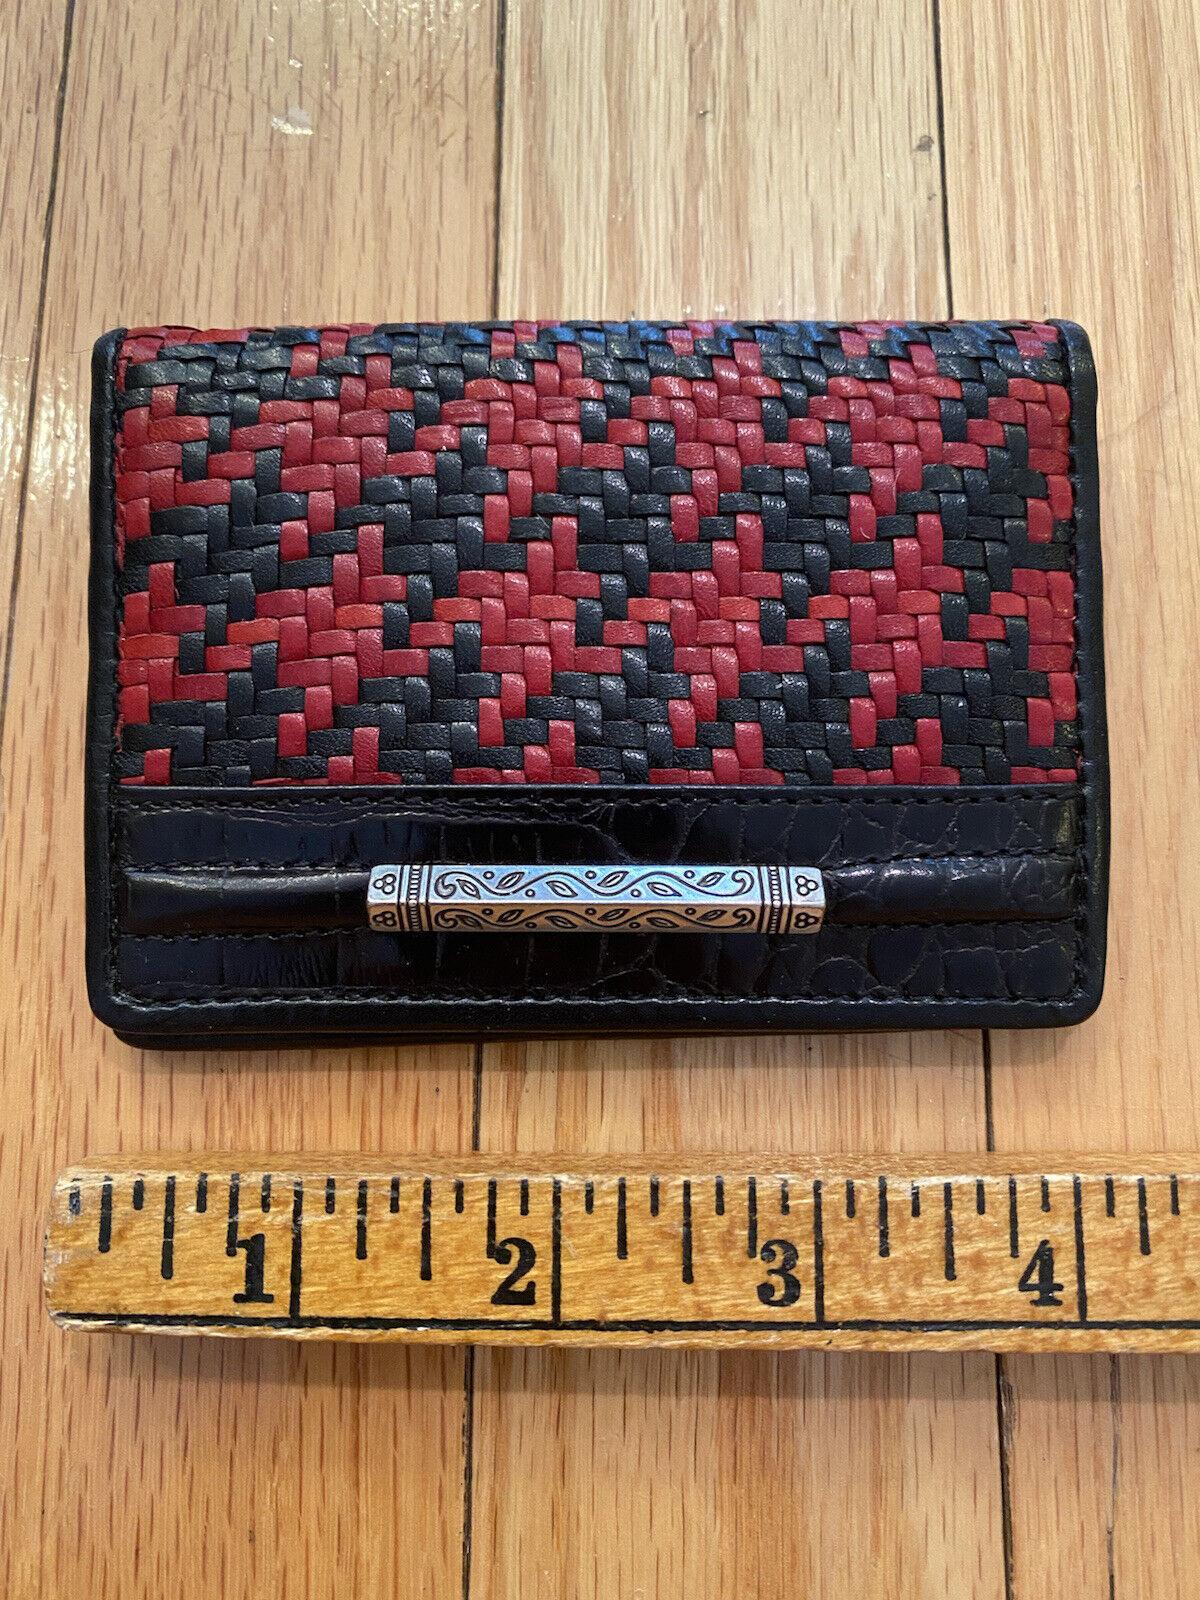 Brighton Black & Red Oxford Card Case, Woven Herringbone Design